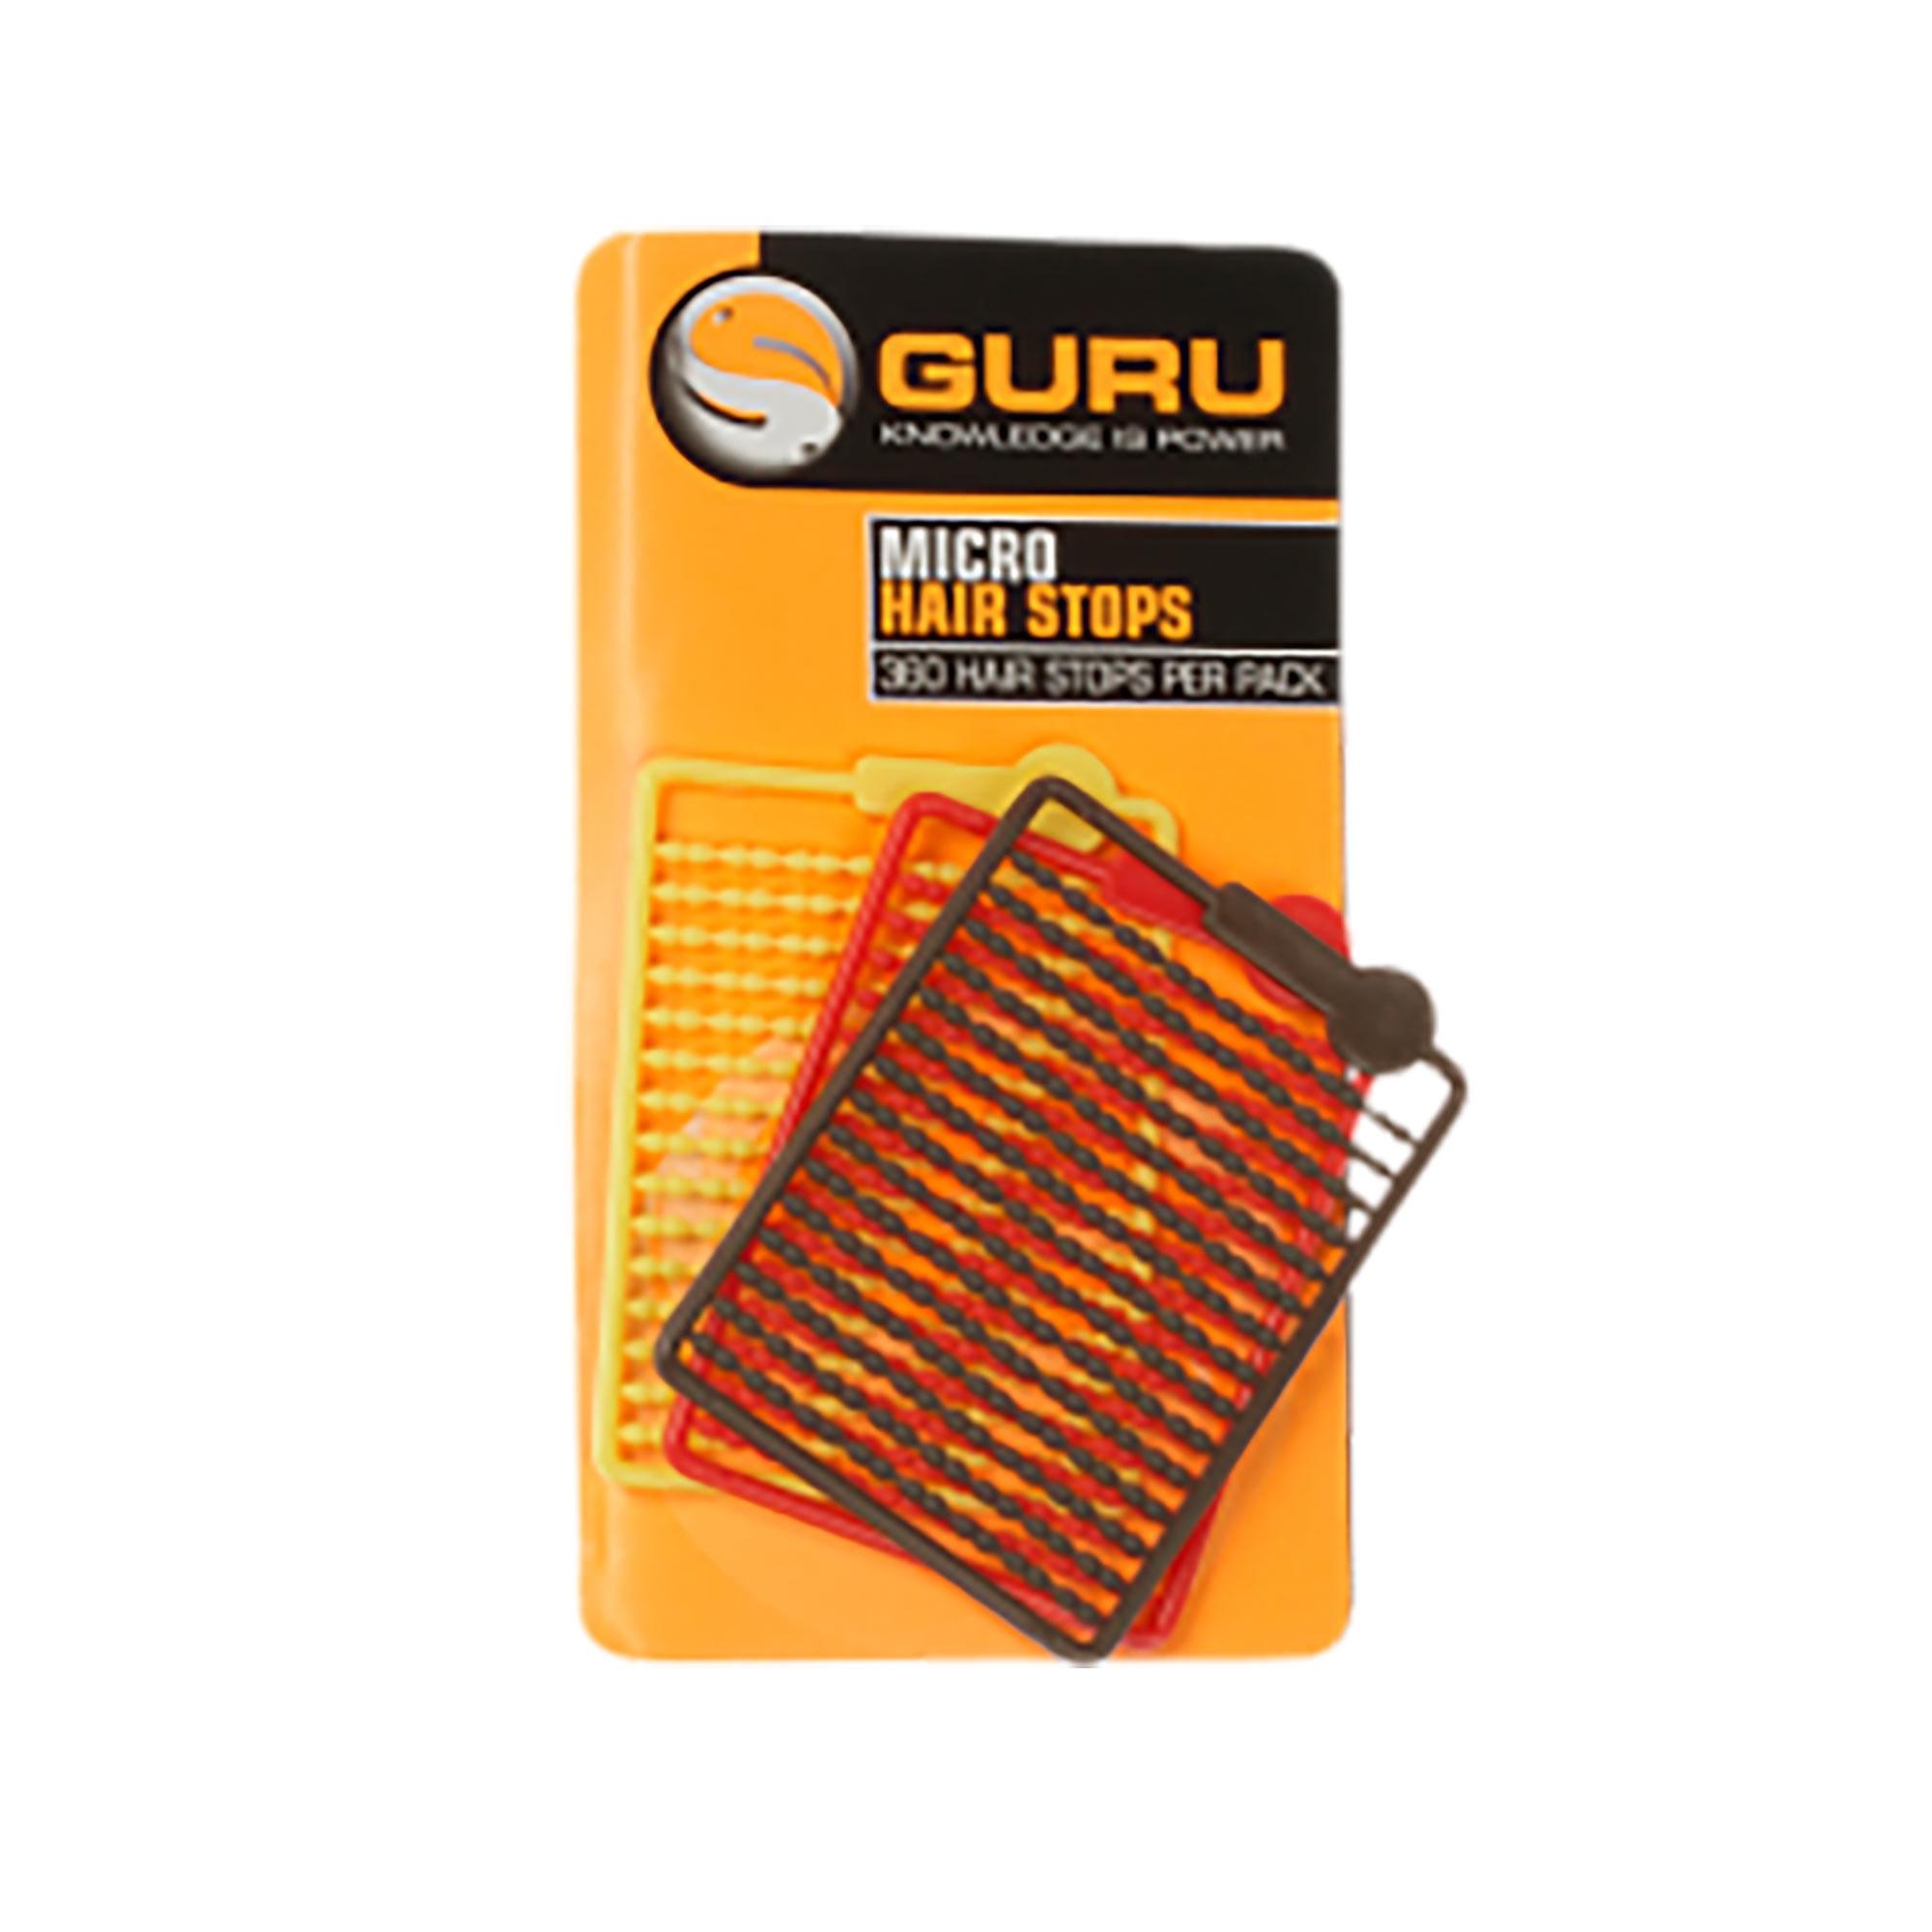 Micro hair stops GURU